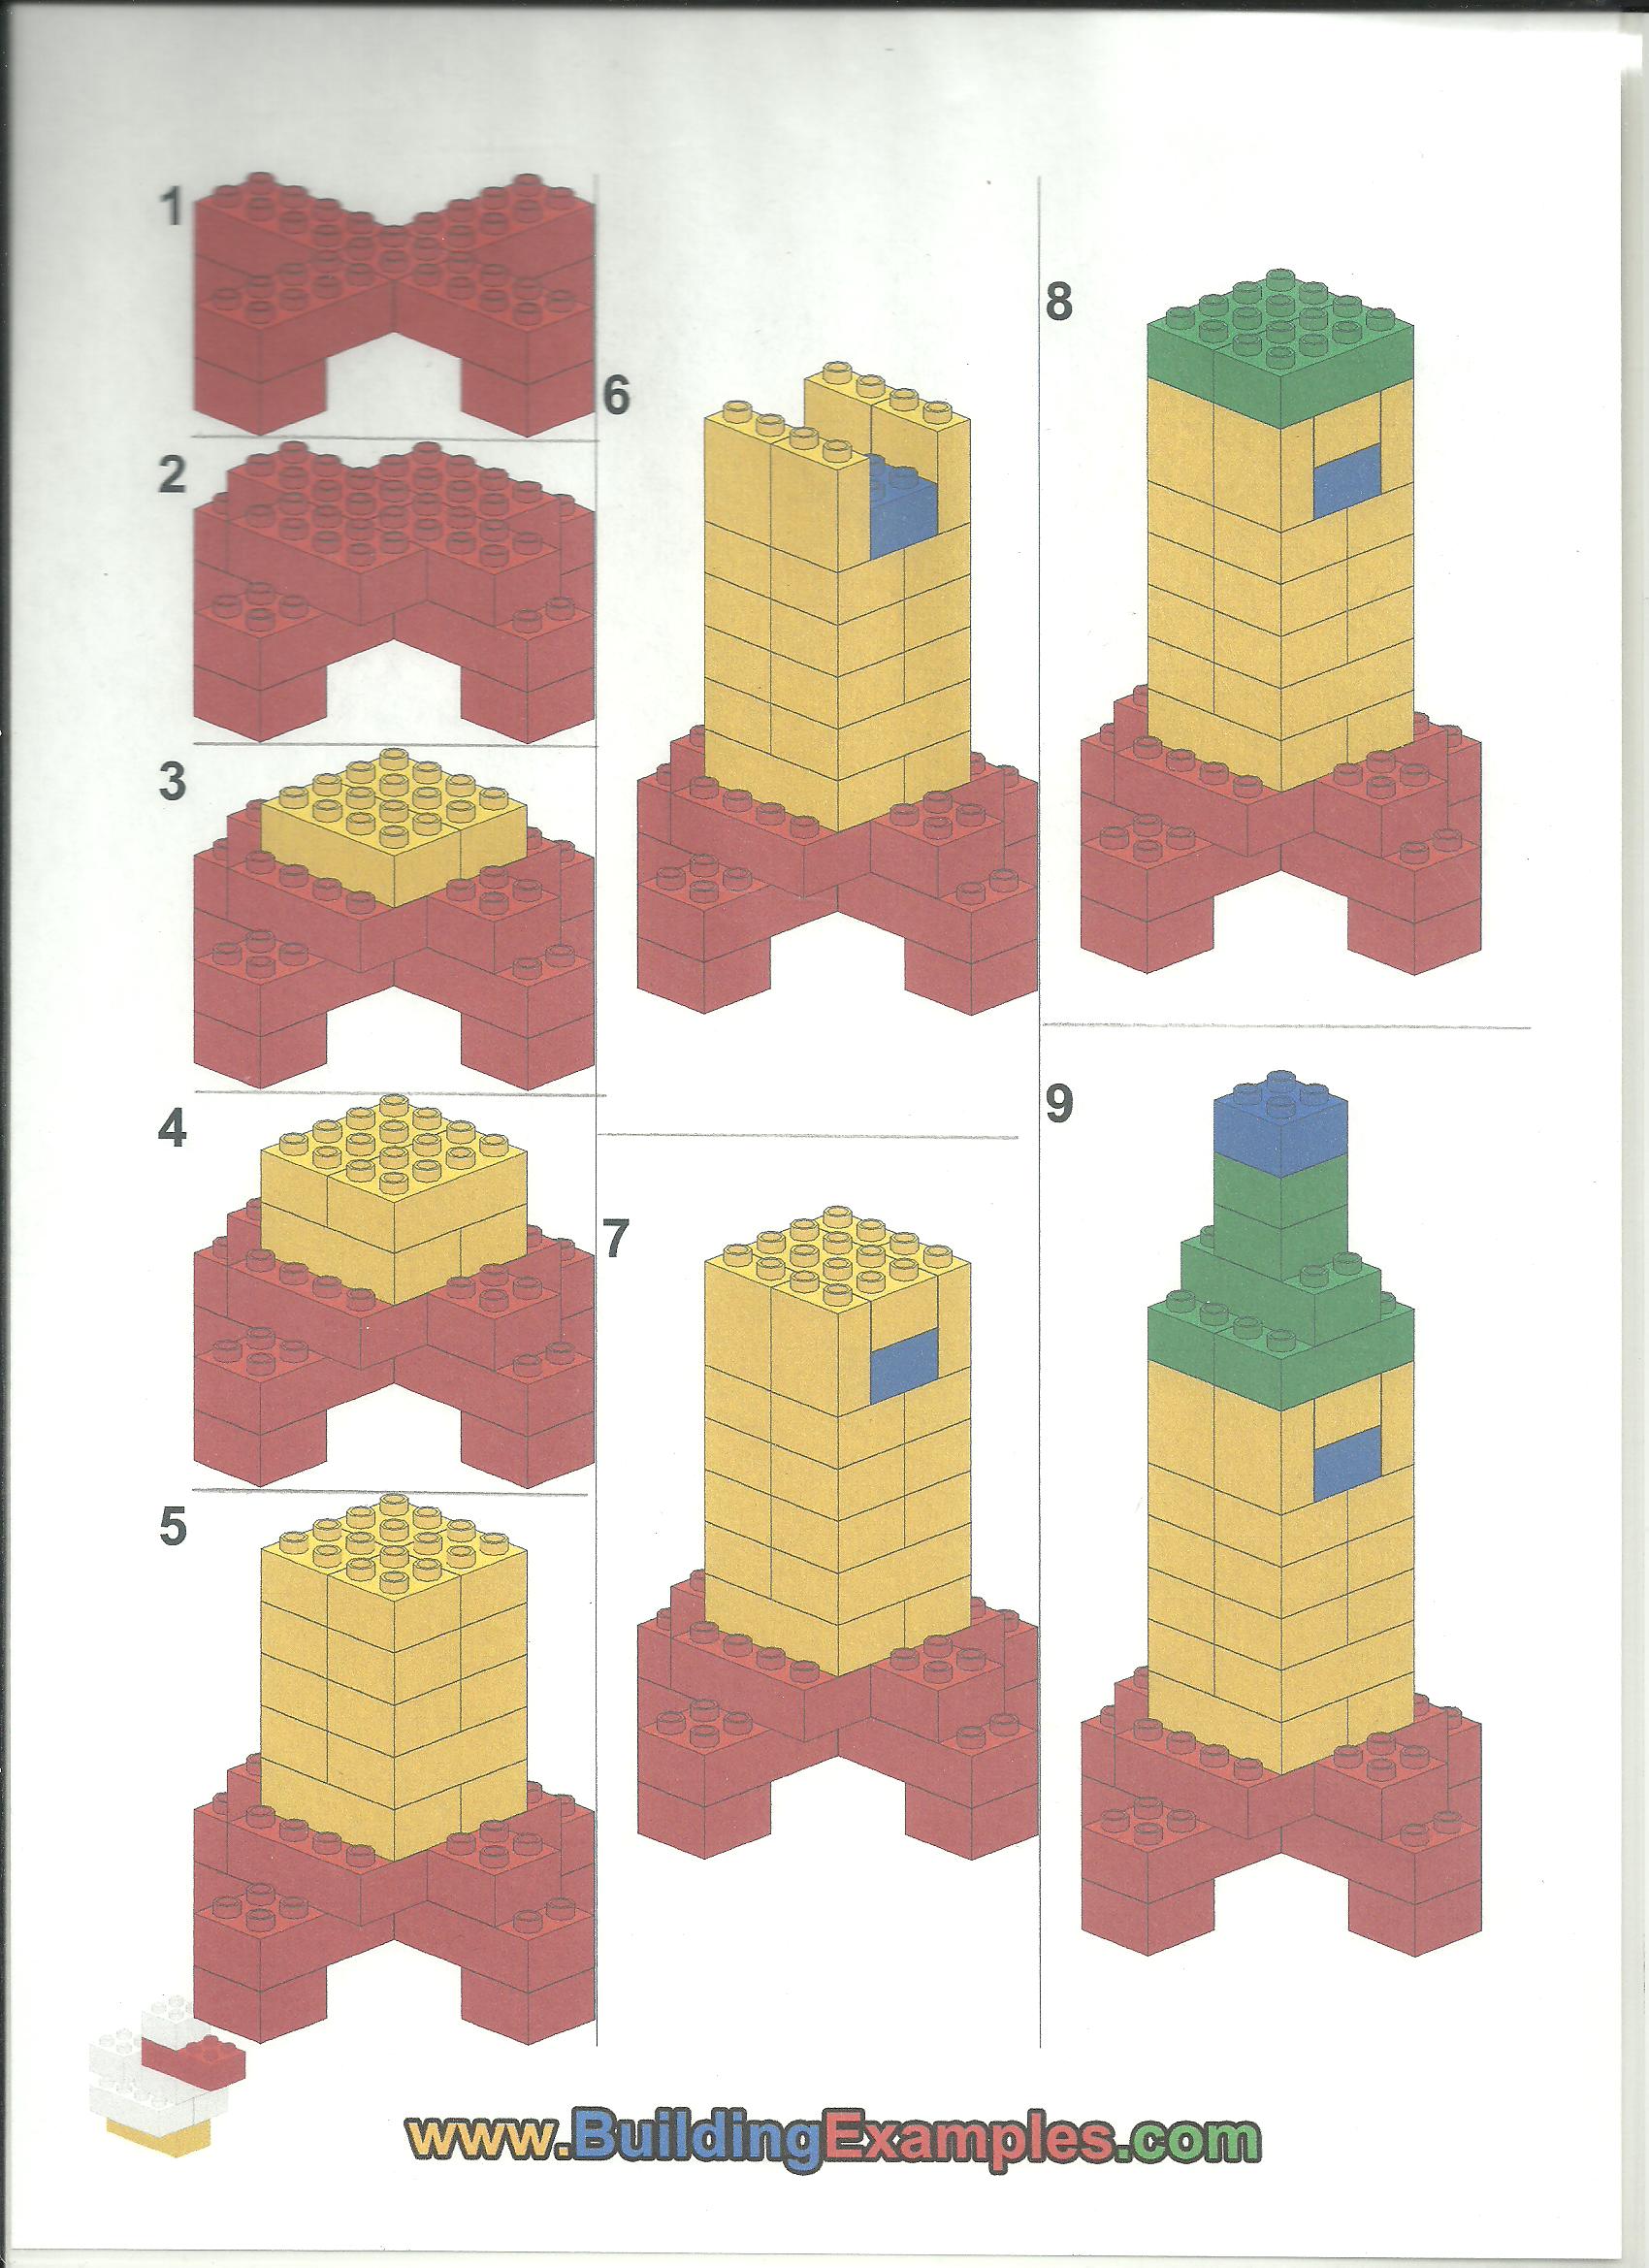 Bouwplan raket maken lego thema sterren en planeten pinterest lego l - Idee construction lego ...